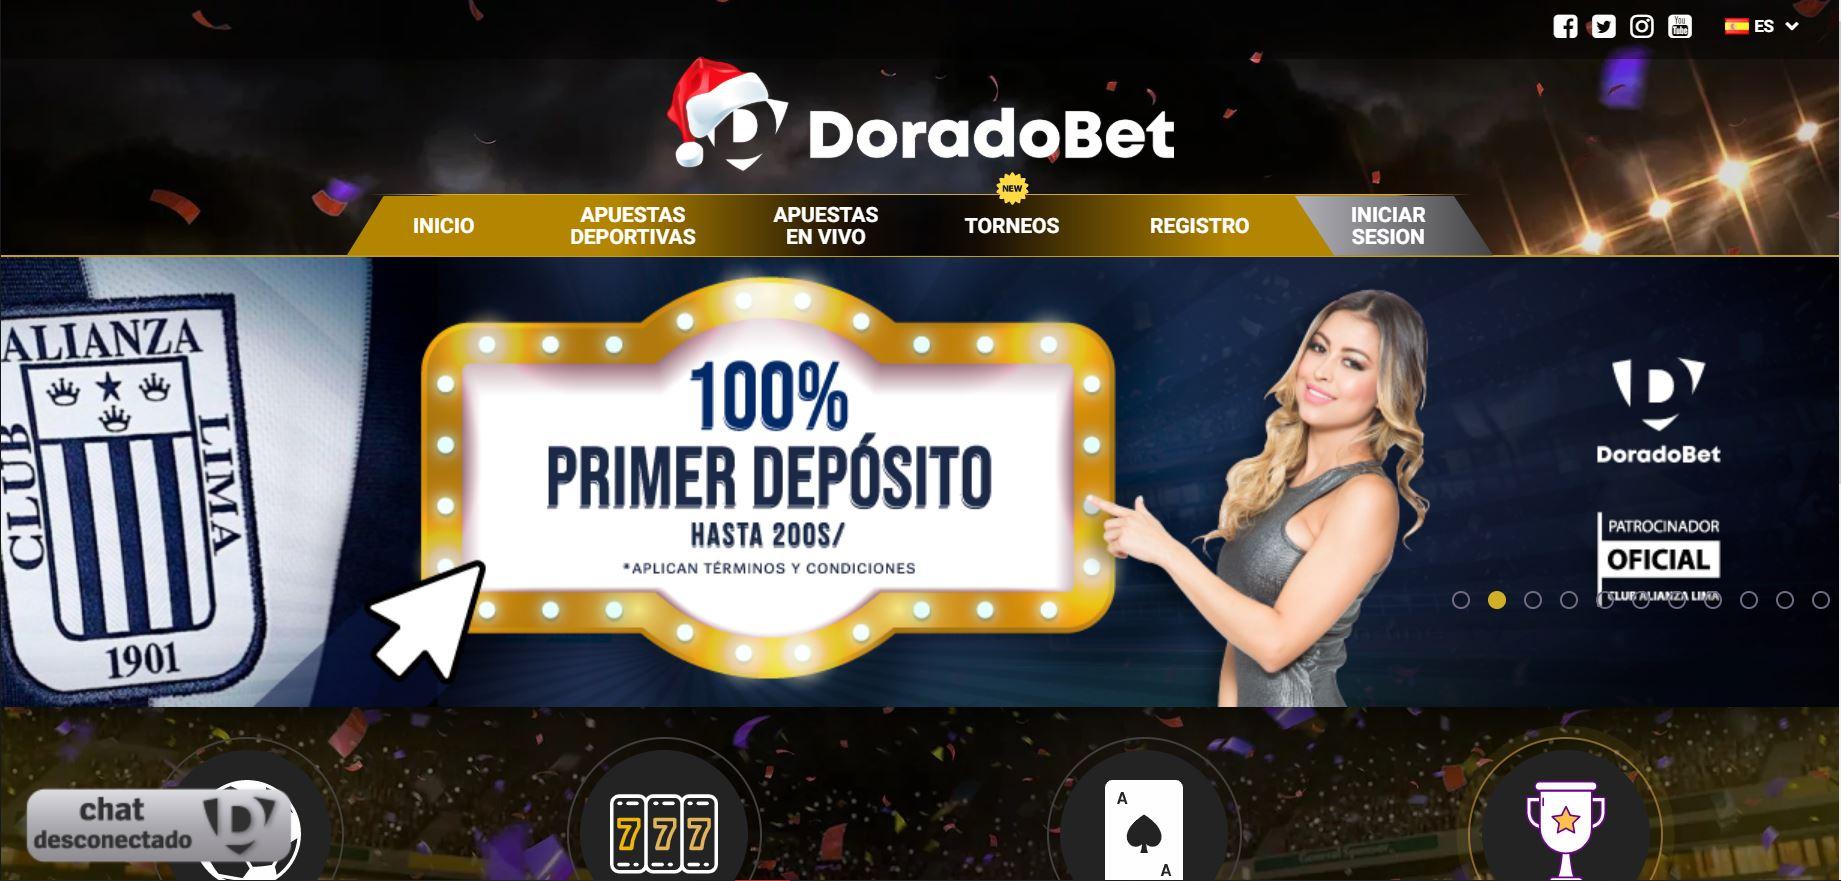 DoradoBet Perú